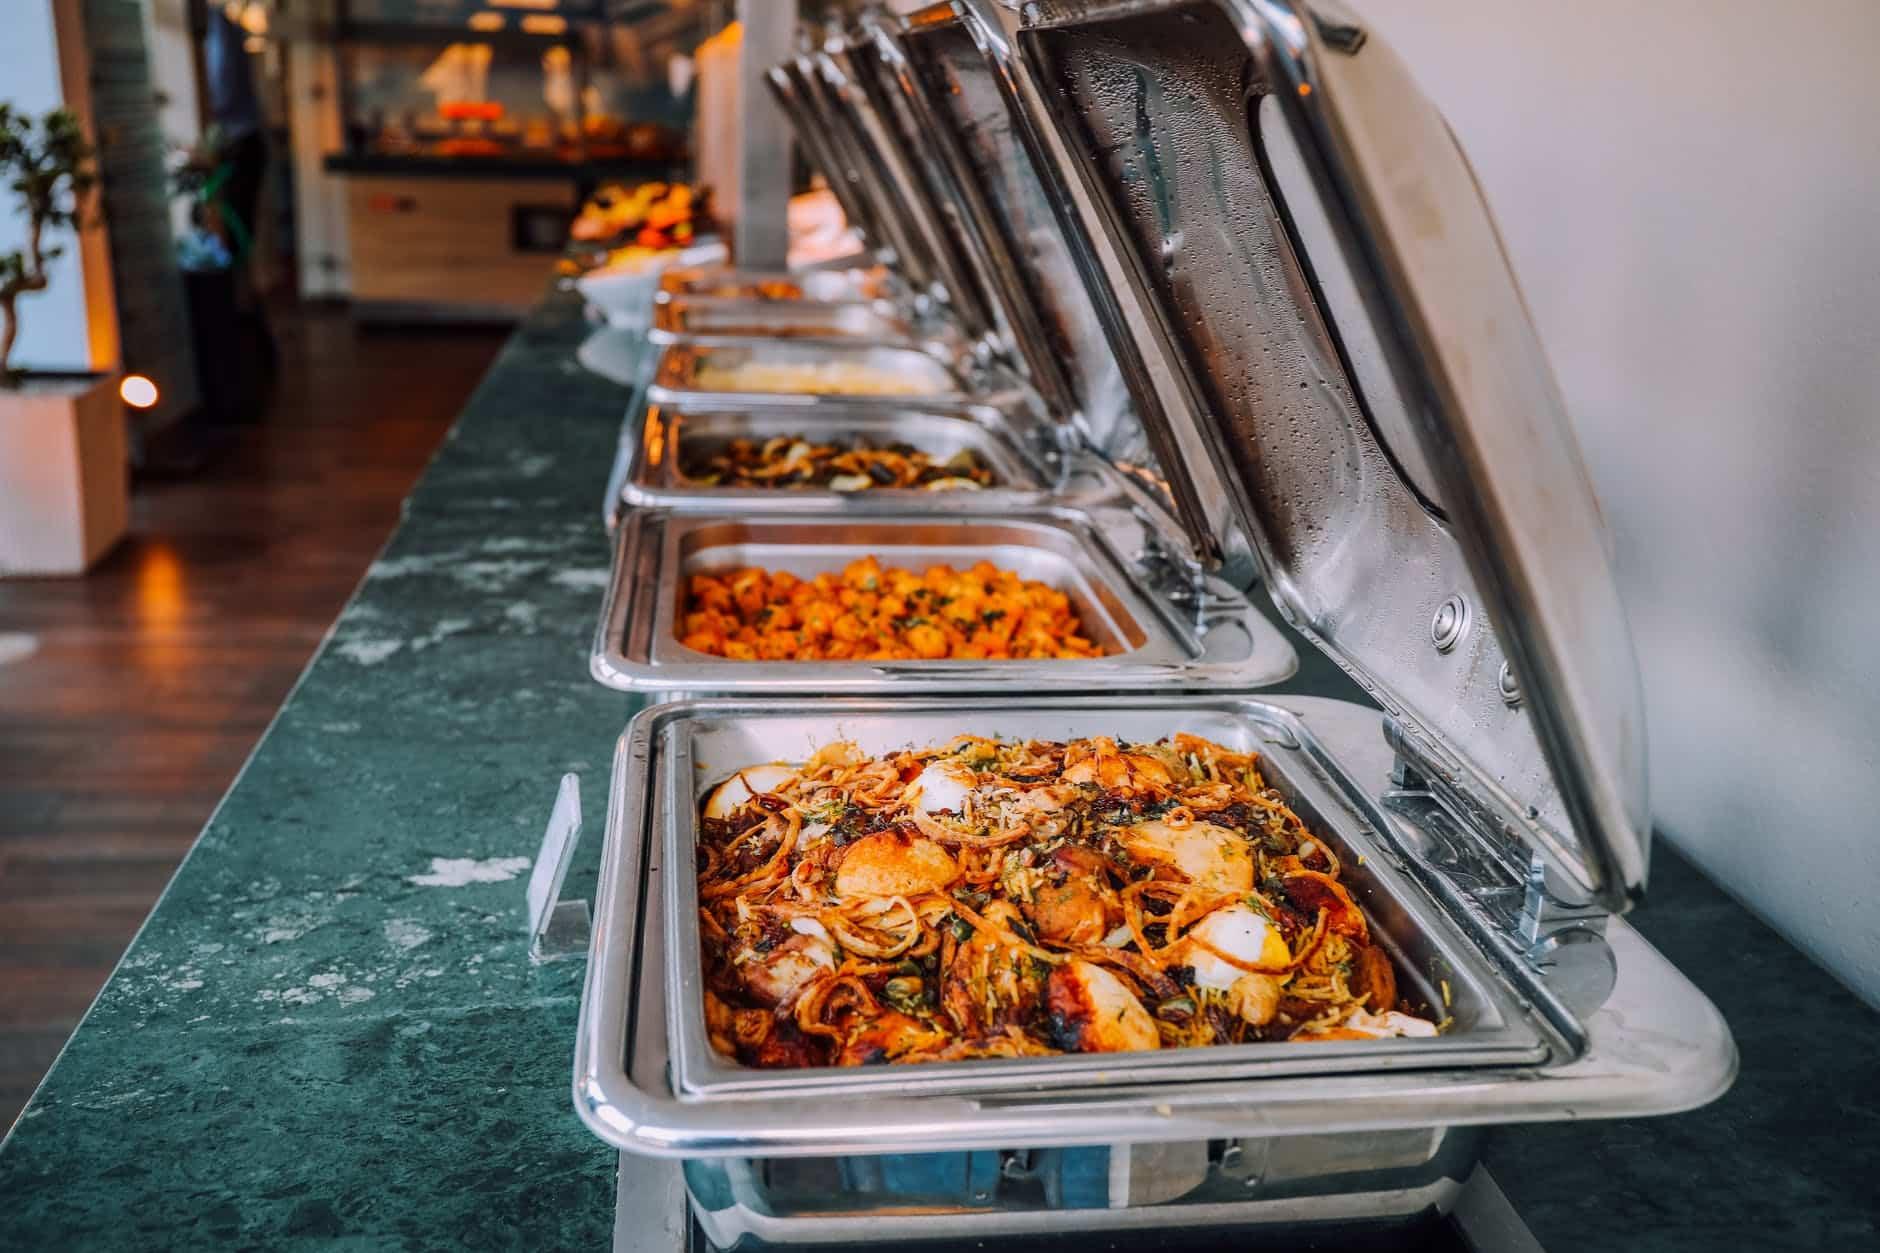 Na czym polega metoda gotowania potraw Sous-vide?